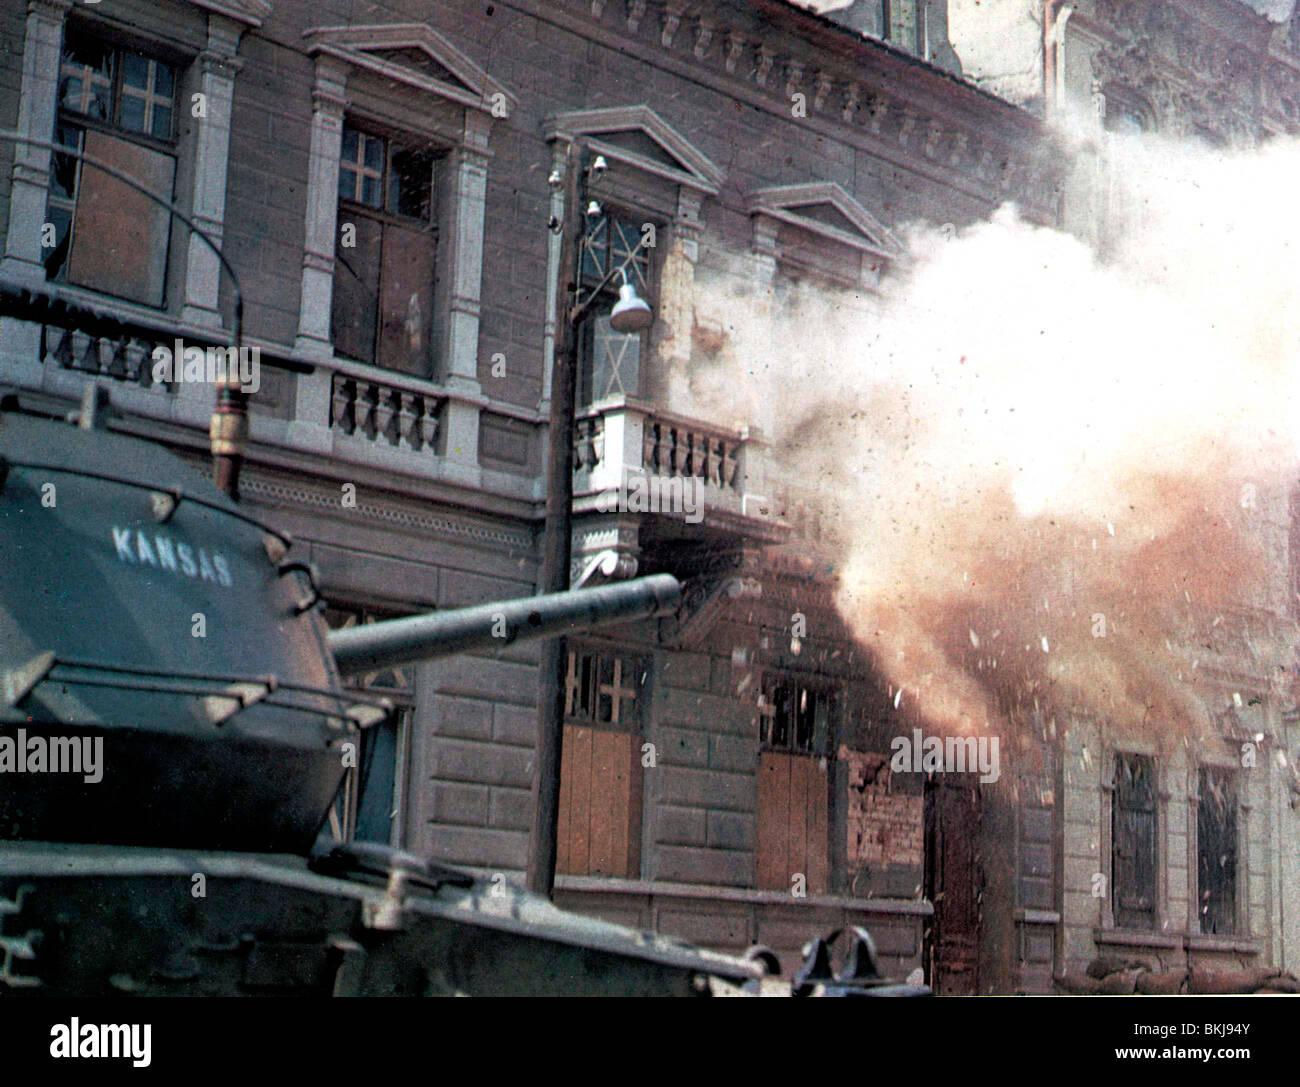 CHE -1969 - Stock Image